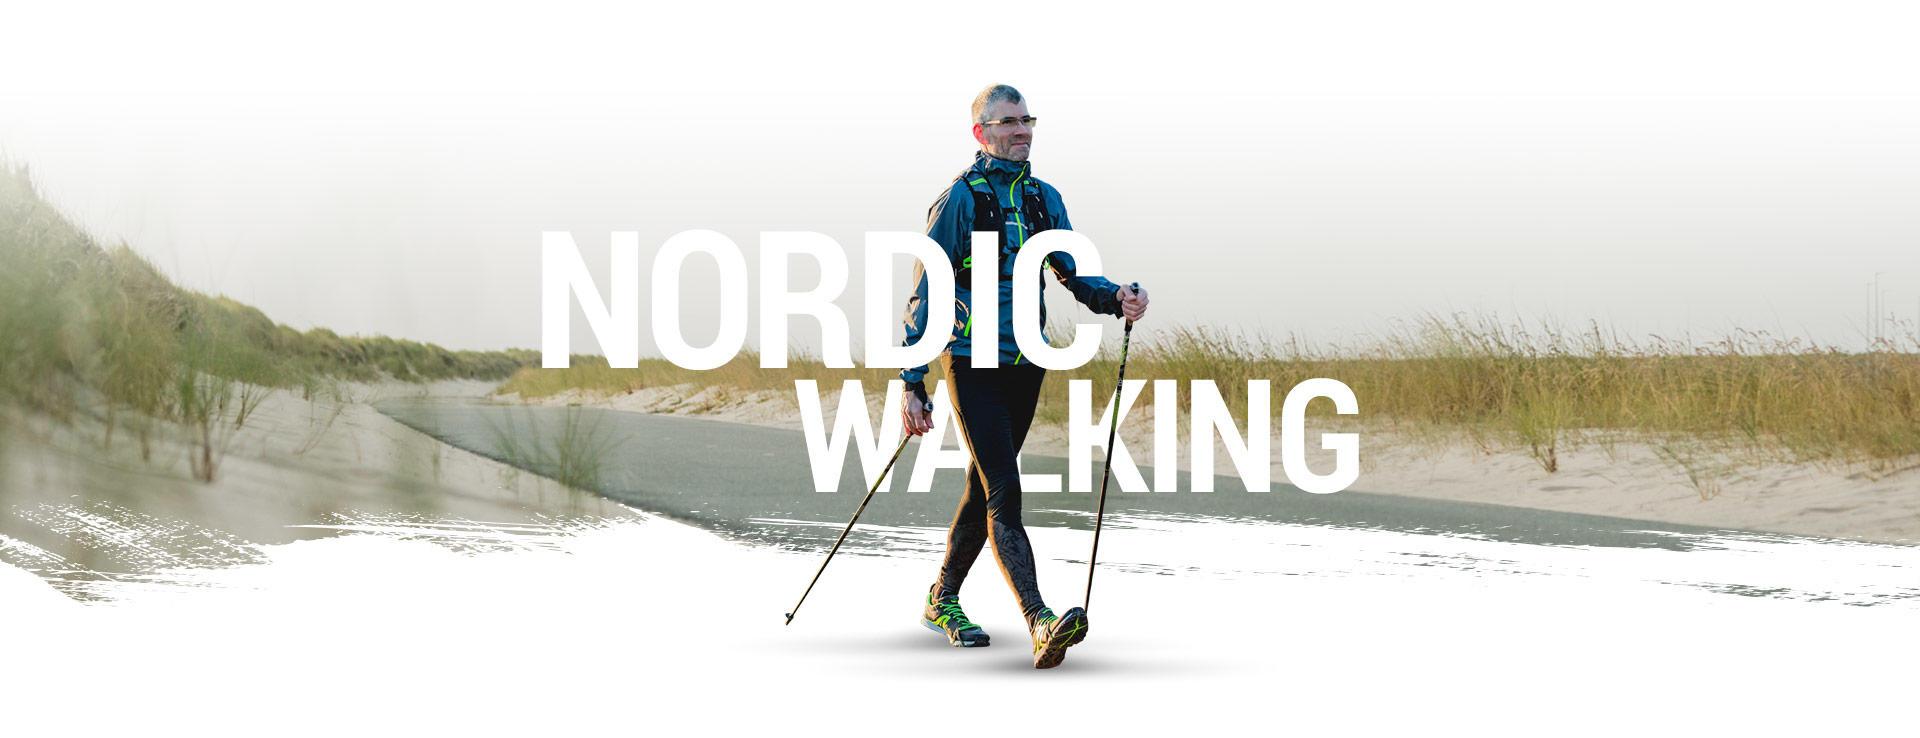 Newfeel nordic walking